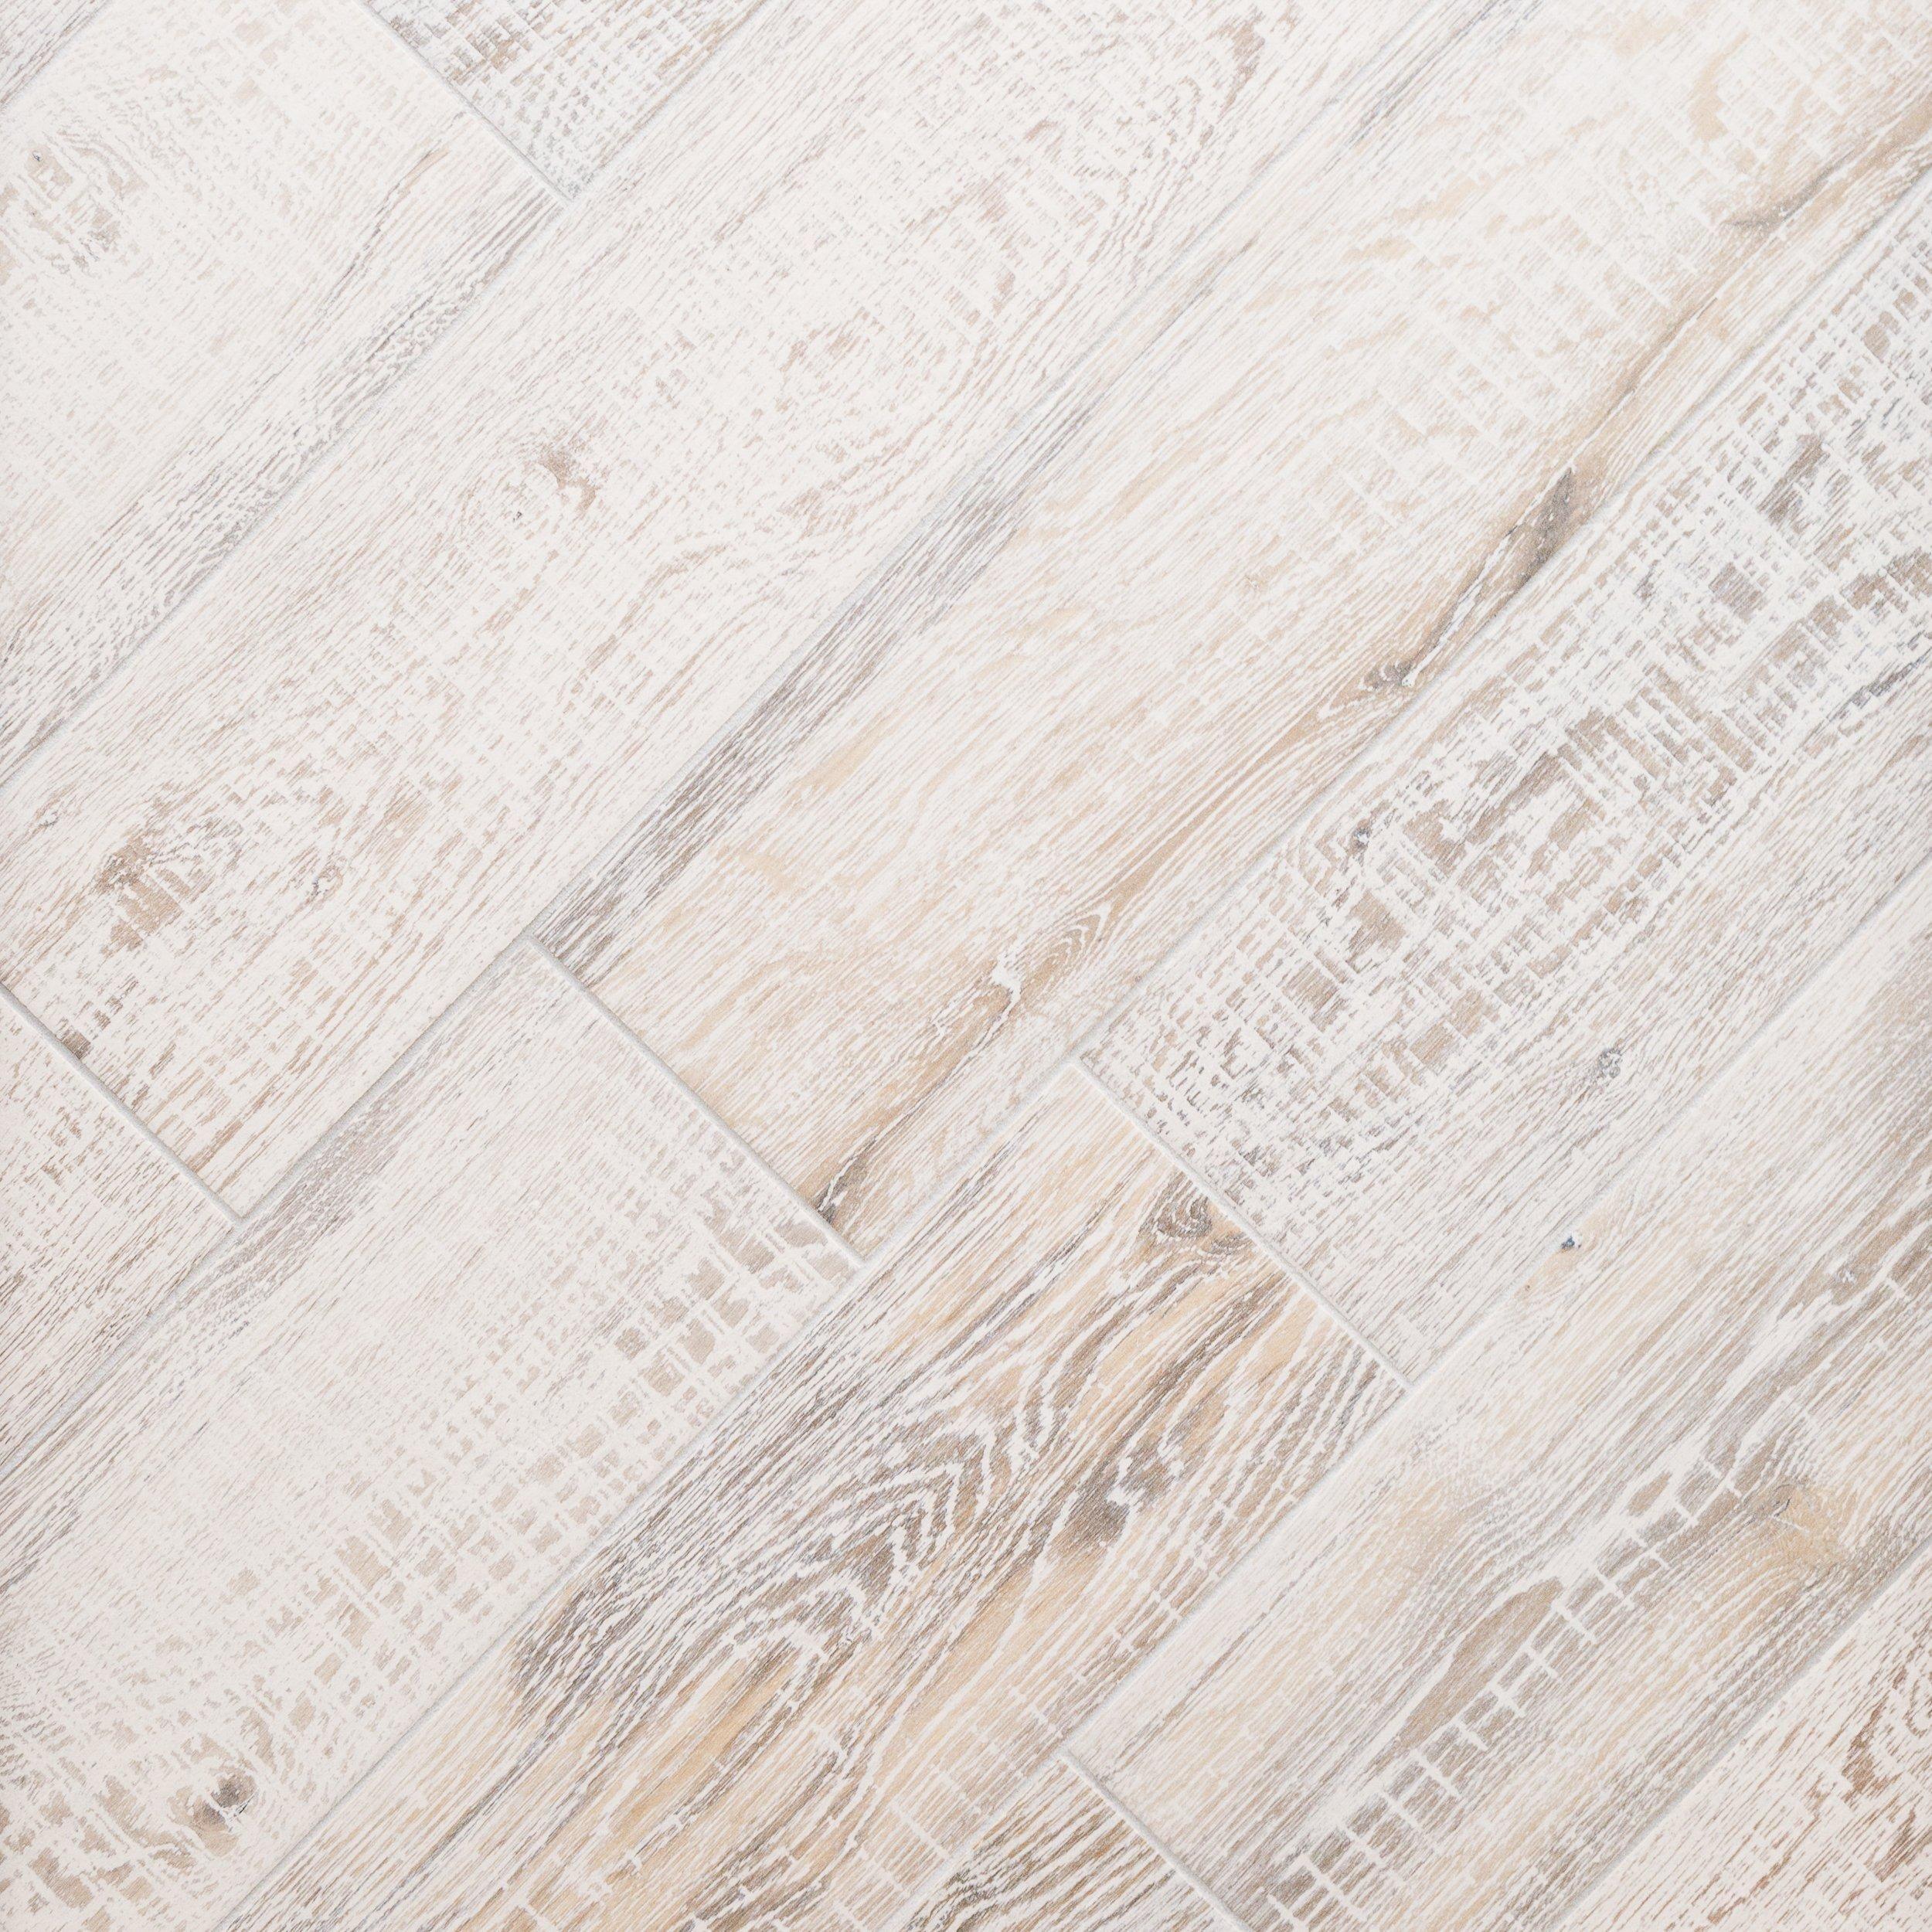 Brixton White Wood Plank Porcelain Tile In 2019